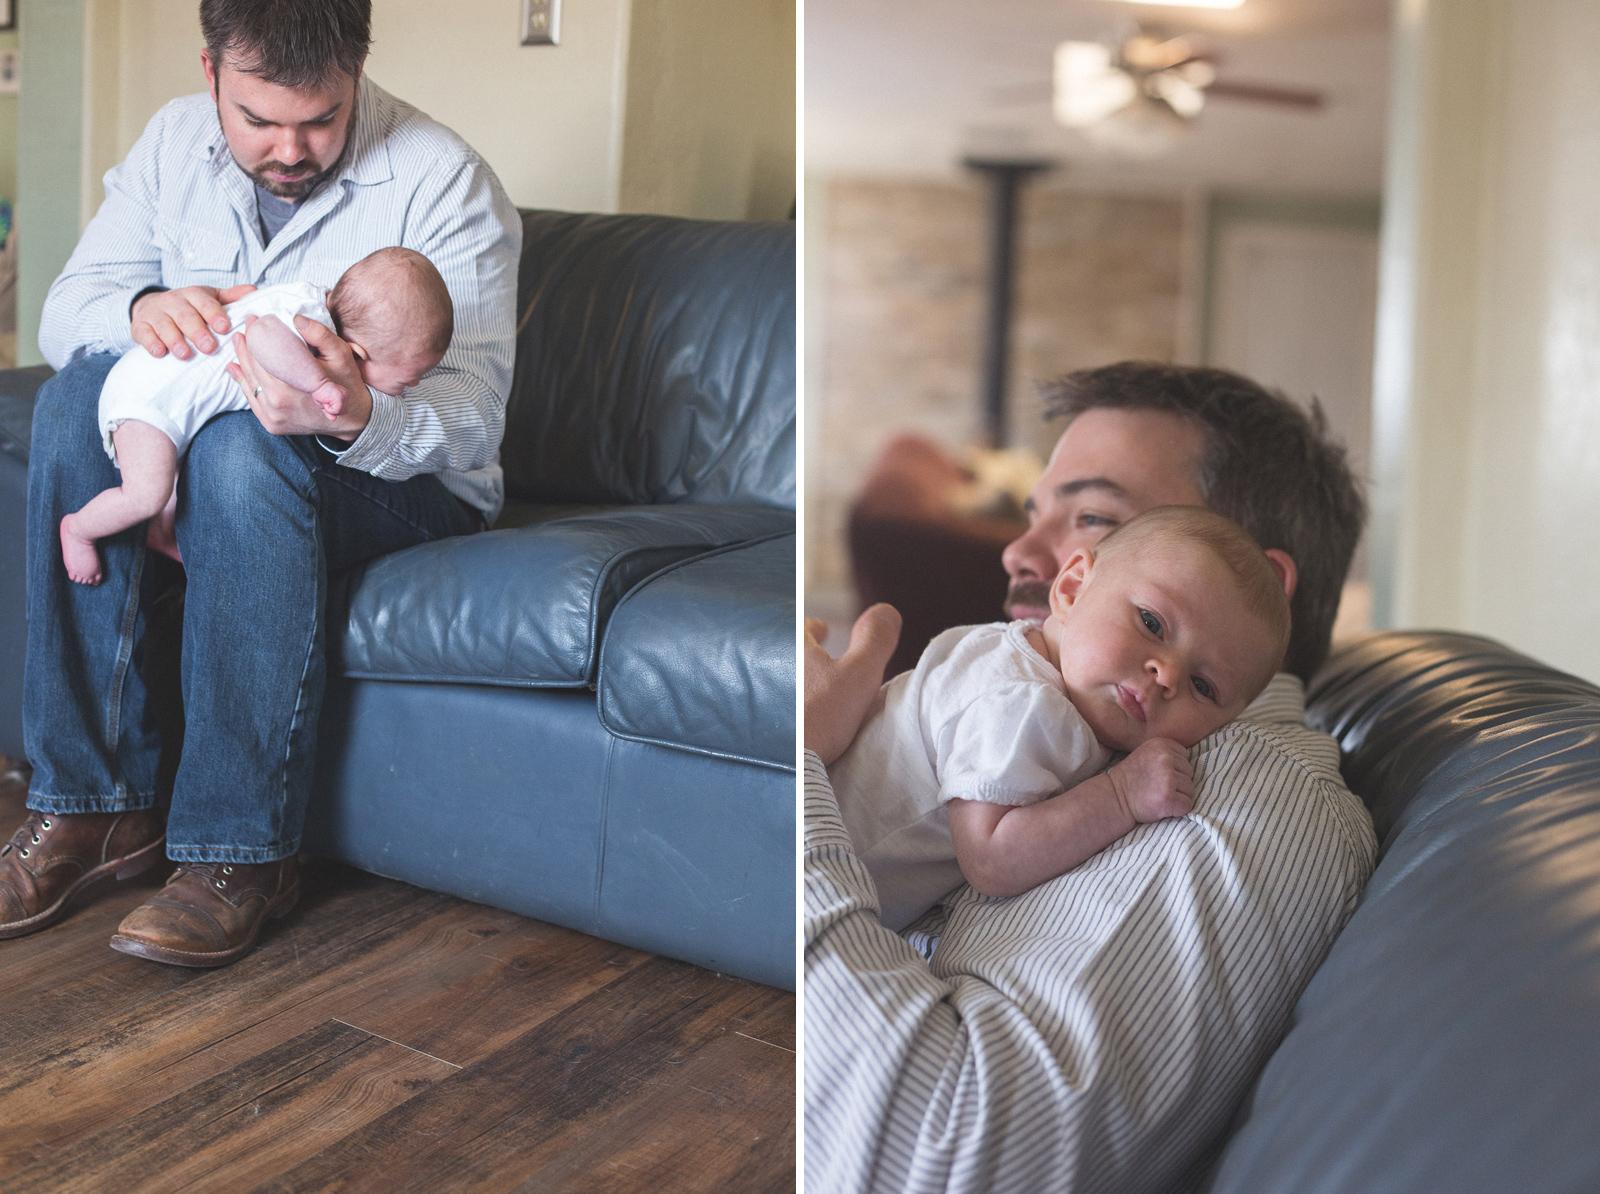 053-newborn-baby-fatherhood-birds-bed-cuddling-new-mexico-farmington